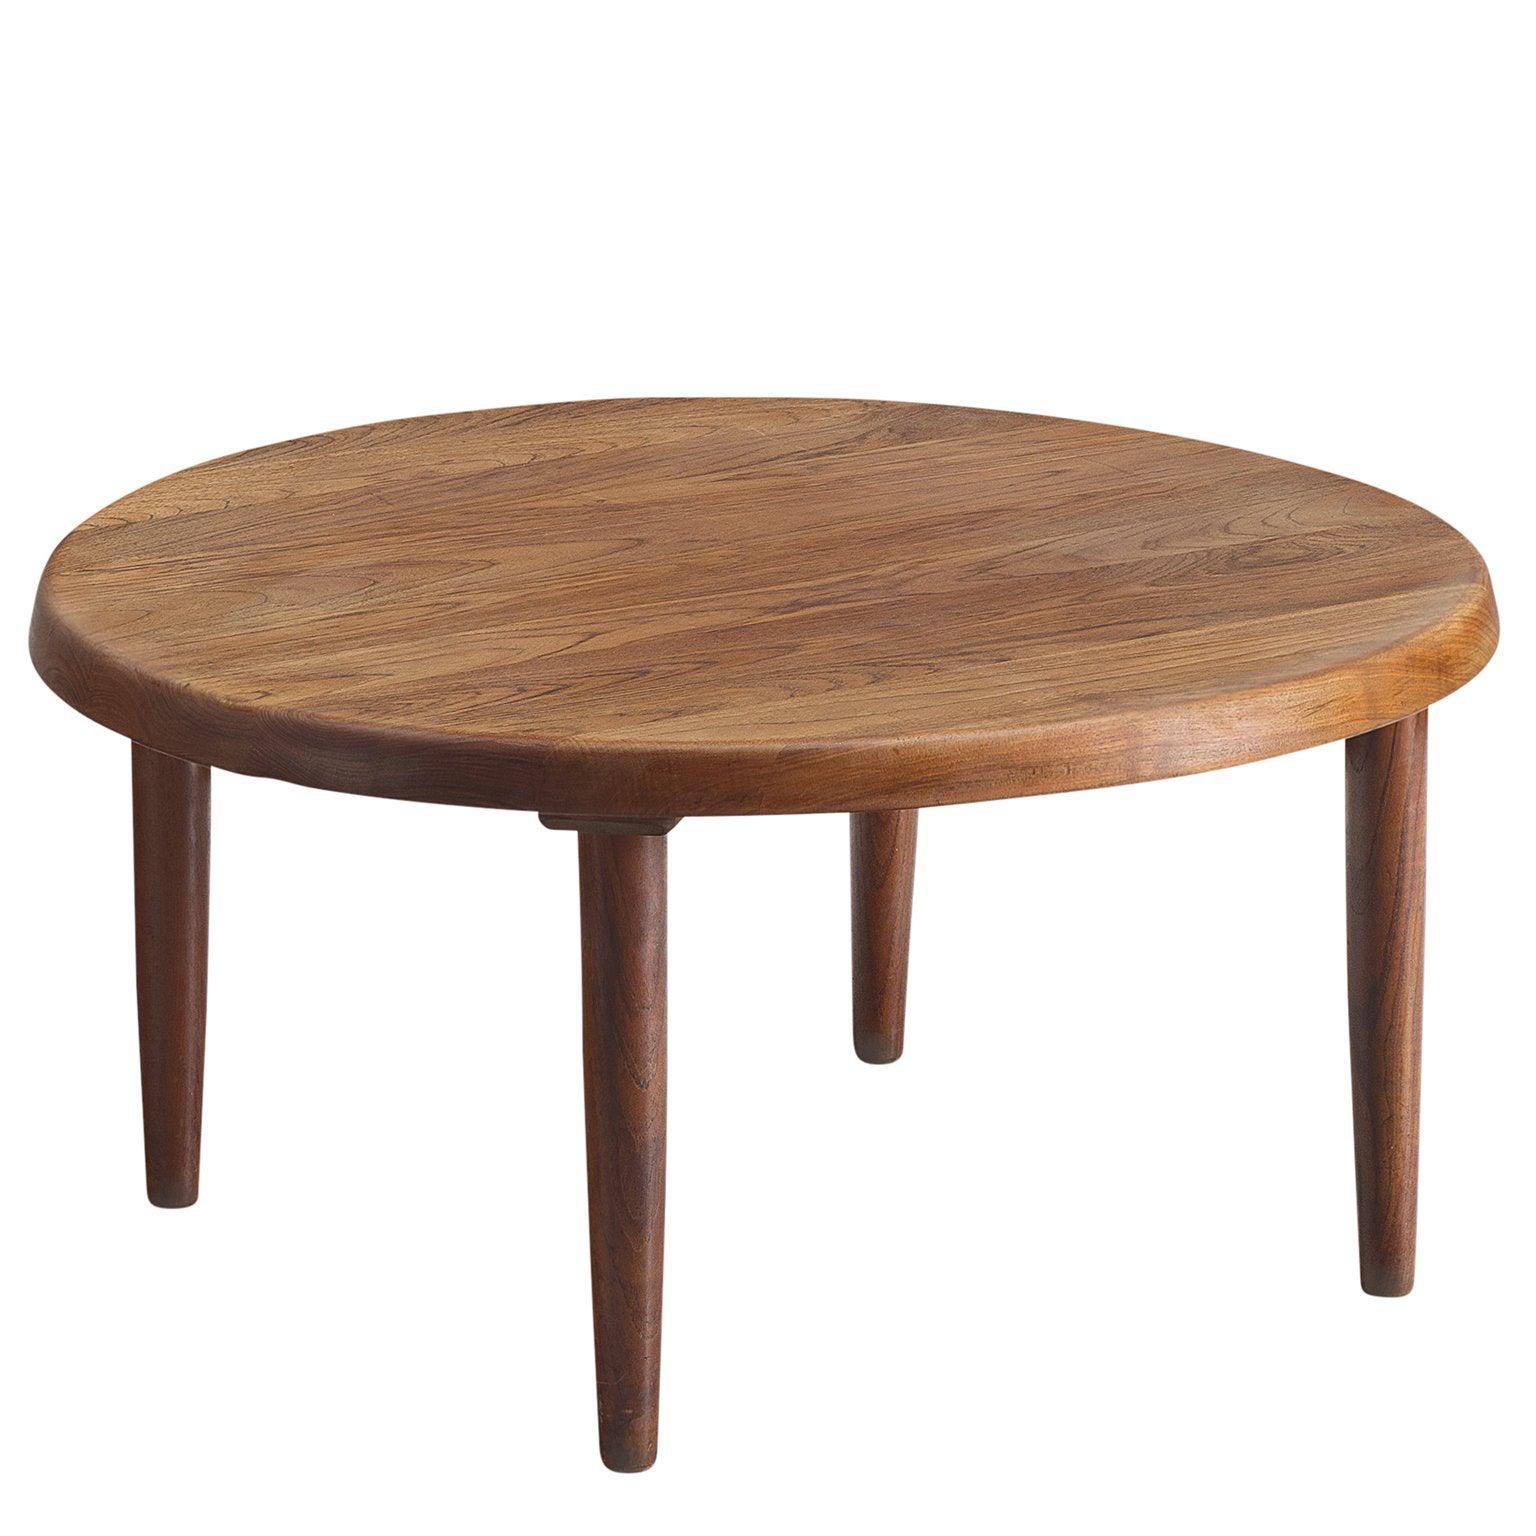 Danish Side Table in Solid Teak, 1950s